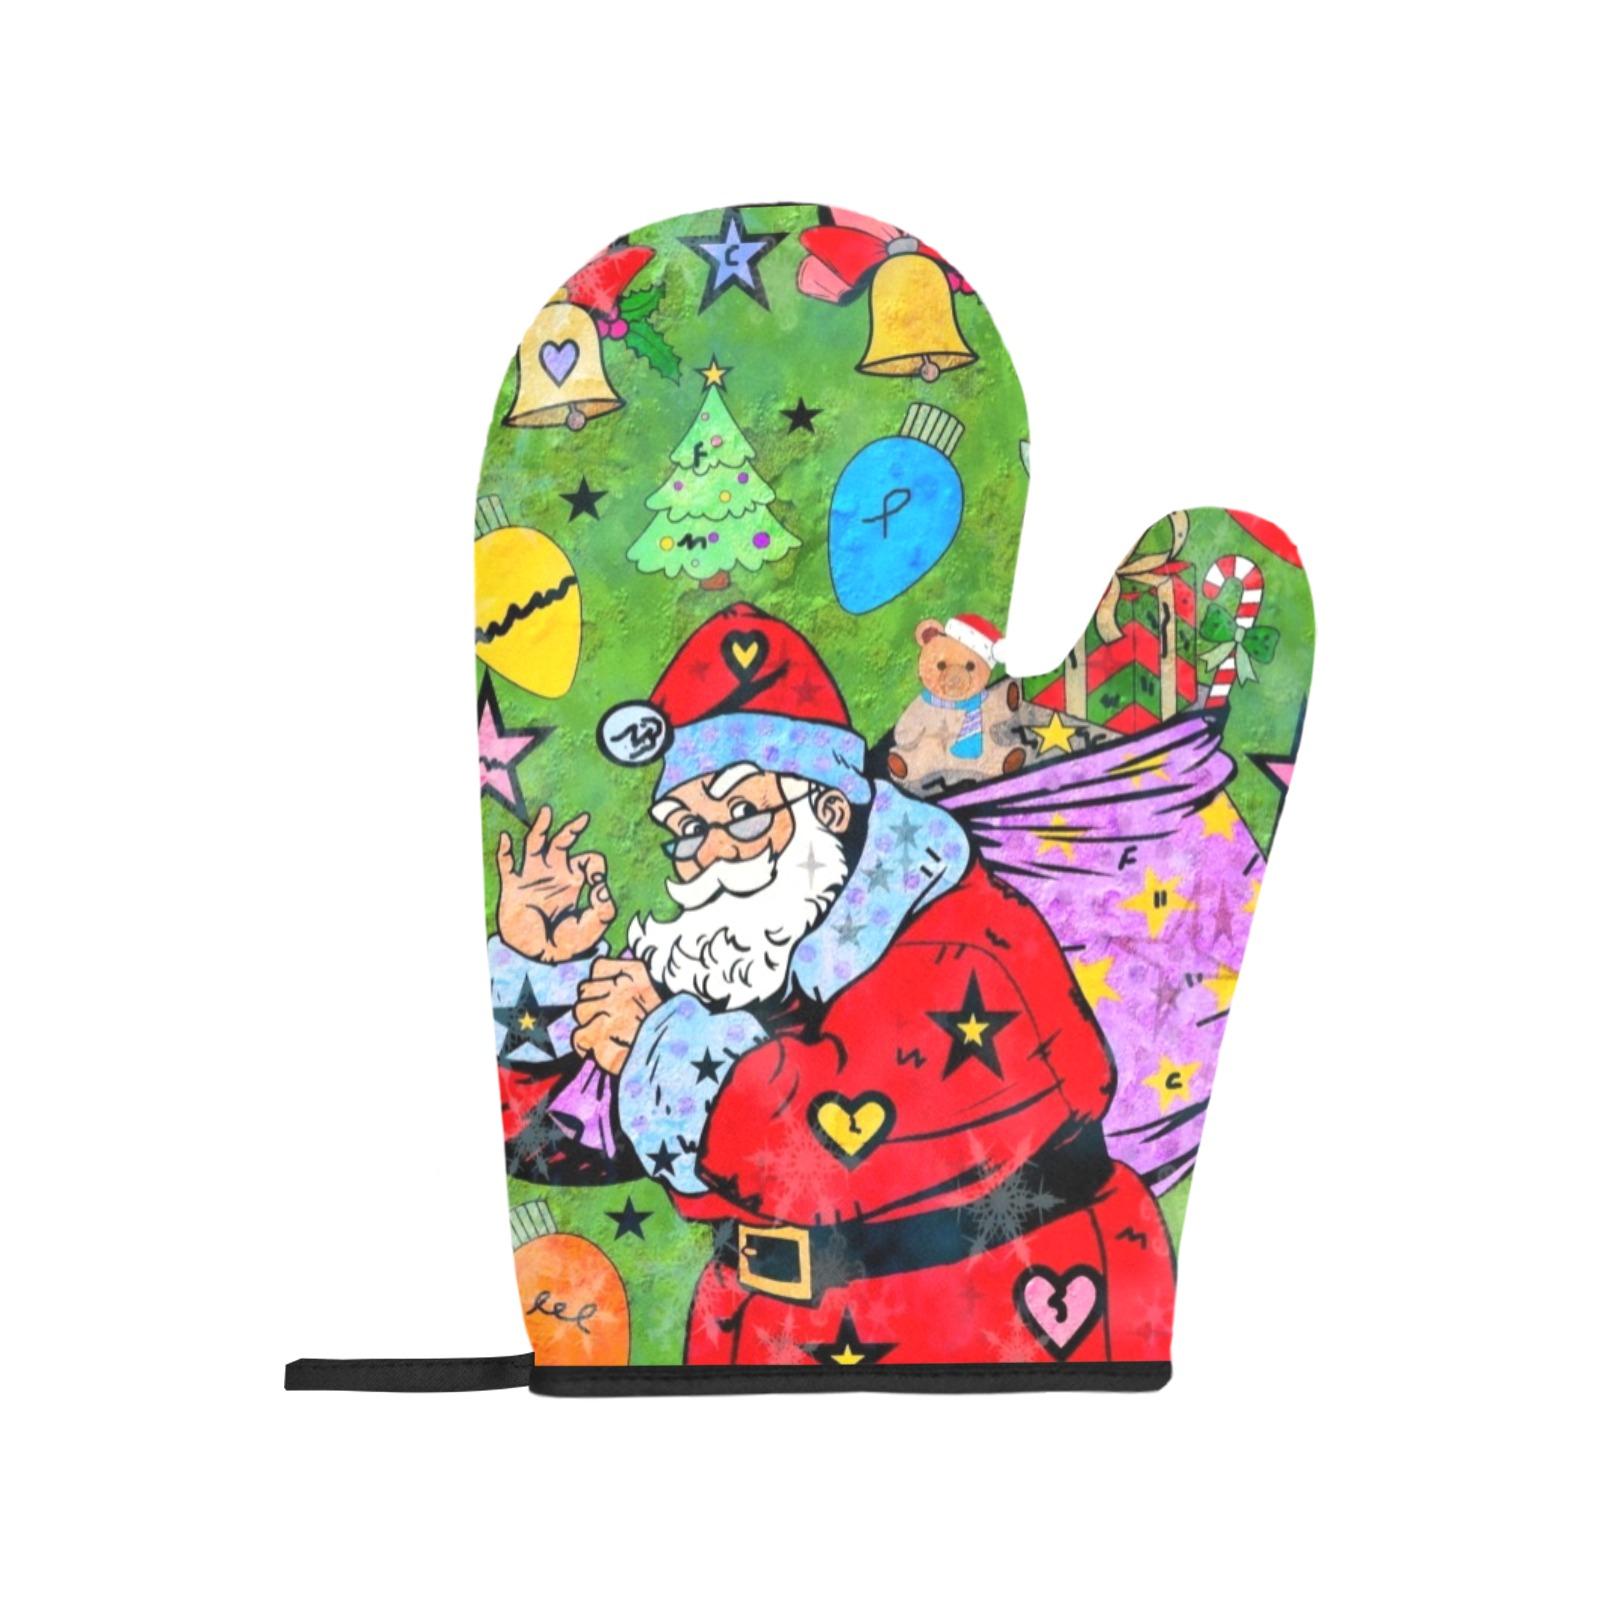 Christmas 2021 by Nico Bielow Oven Mitt & Pot Holder